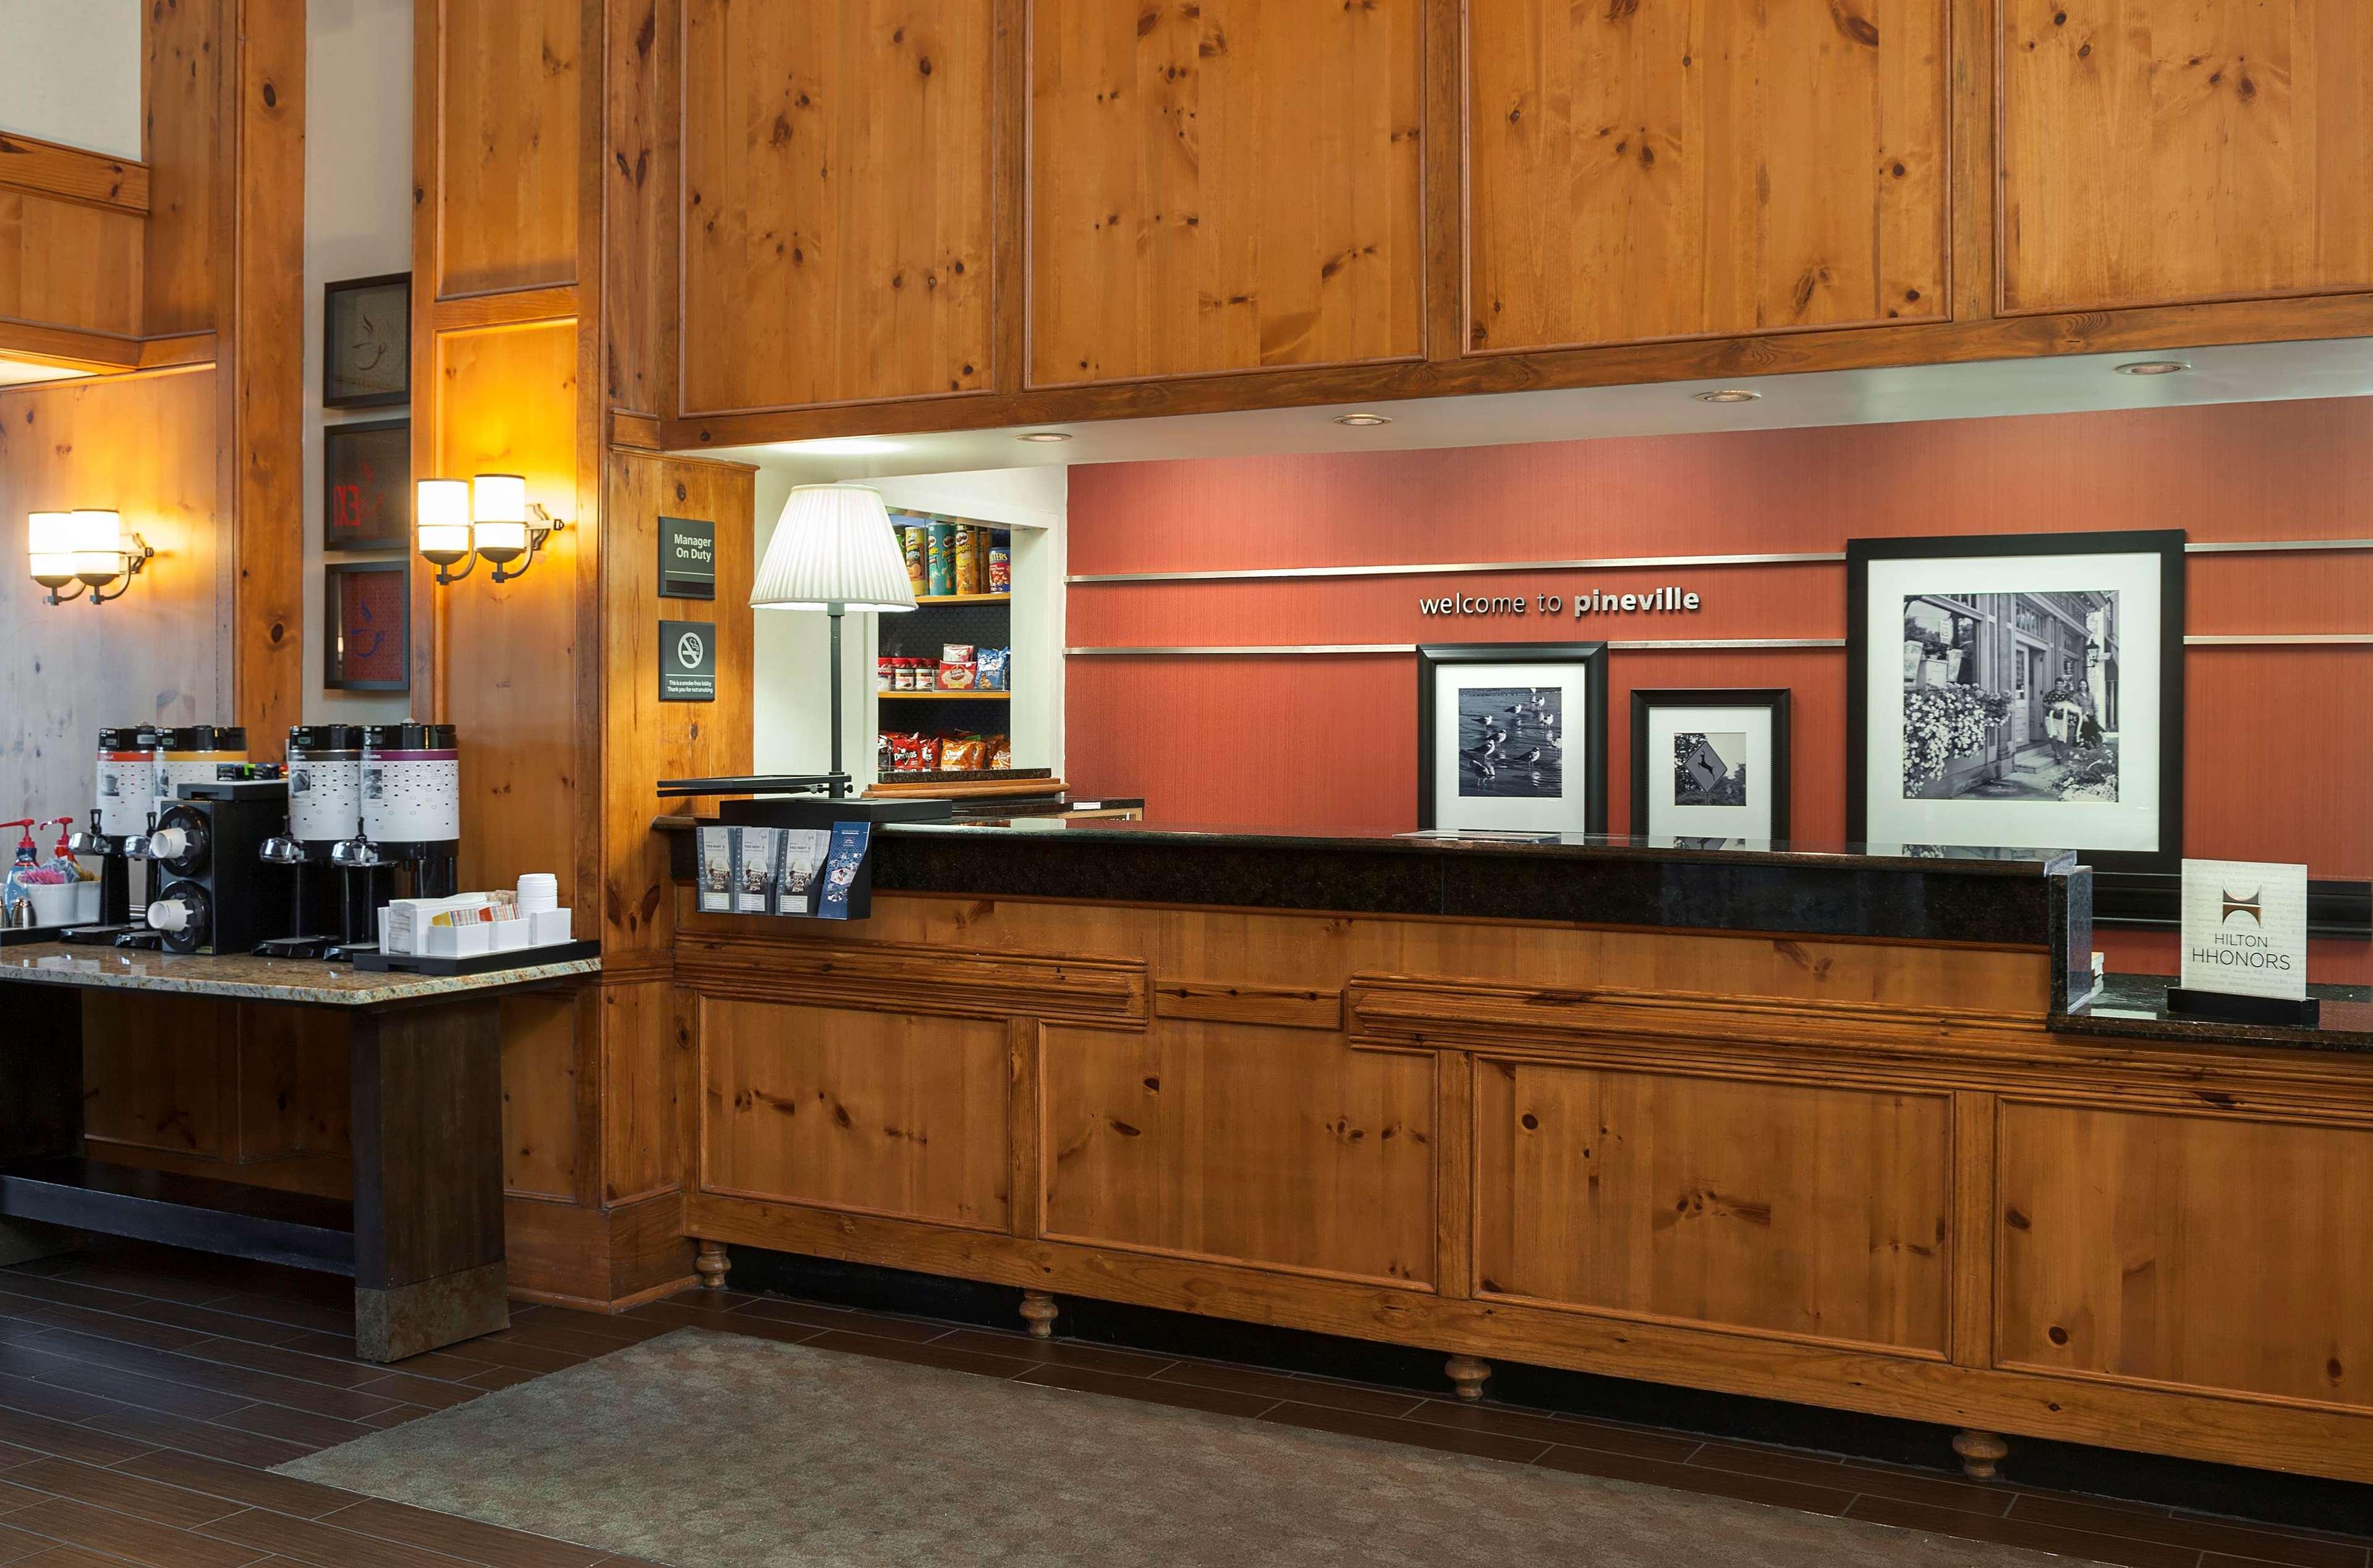 Hampton Inn & Suites Charlotte/Pineville image 3